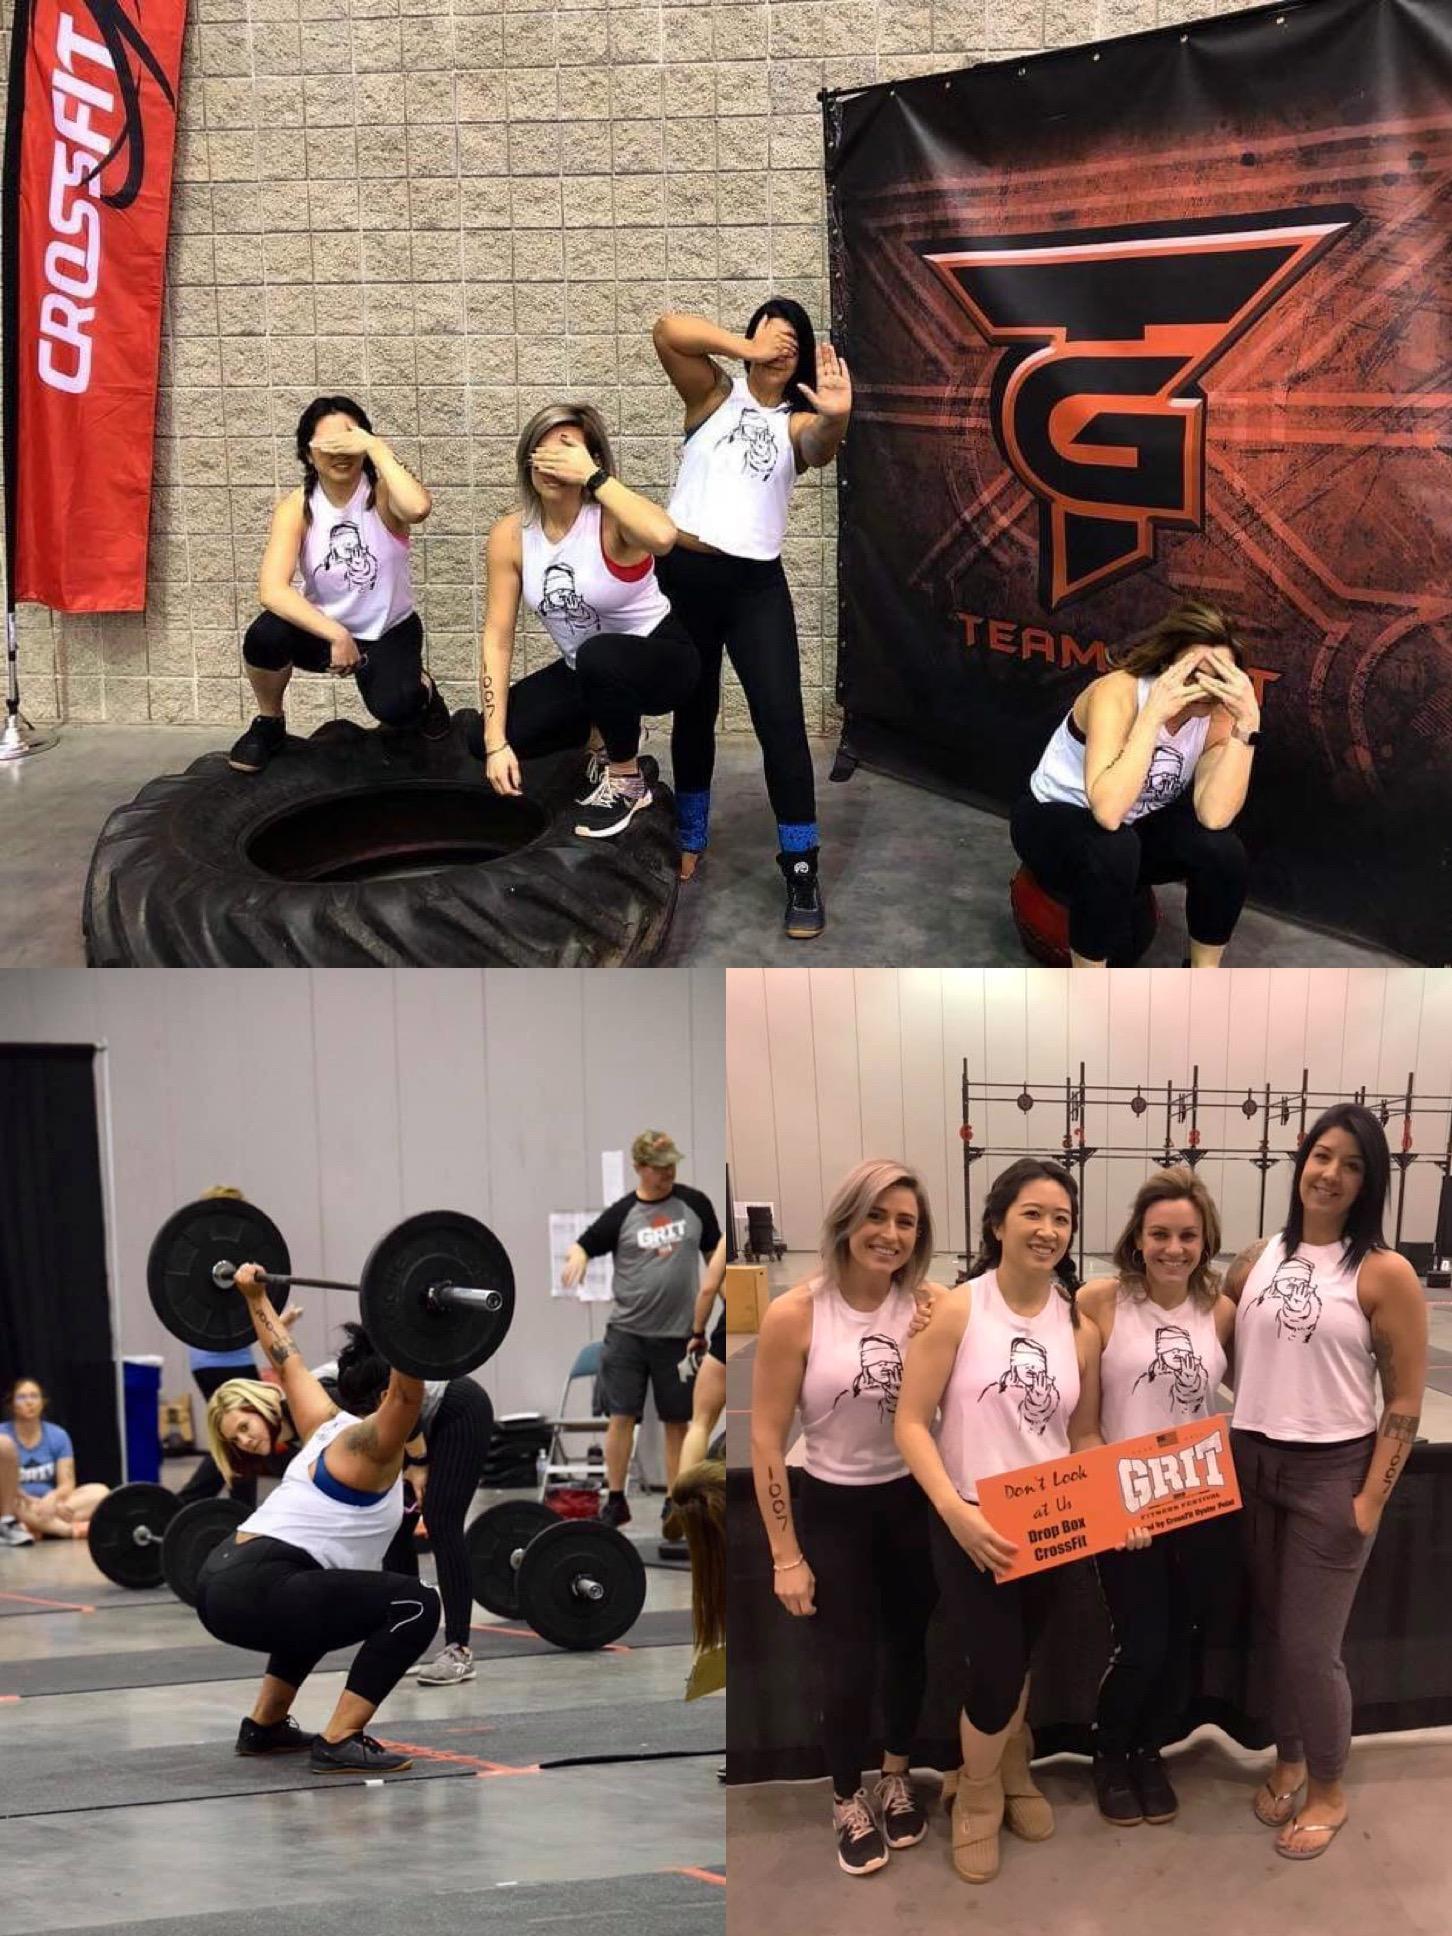 Team Grit '19, bottom right pic: w/ Lauren, Cat, Kelly